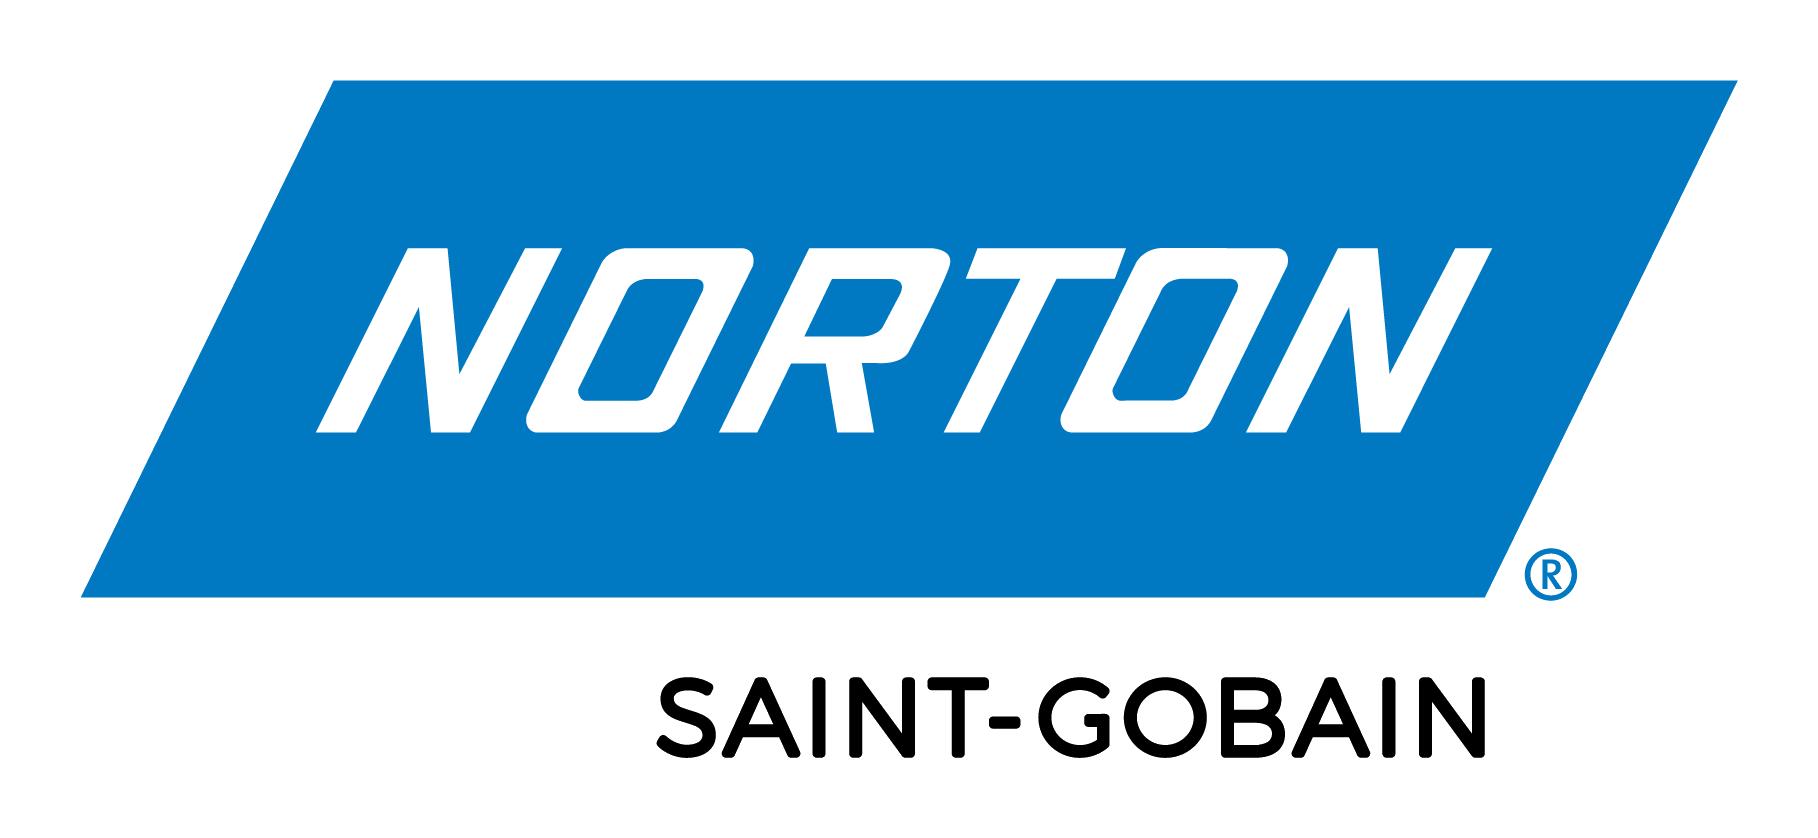 SG_Norton_logo_rgb_5